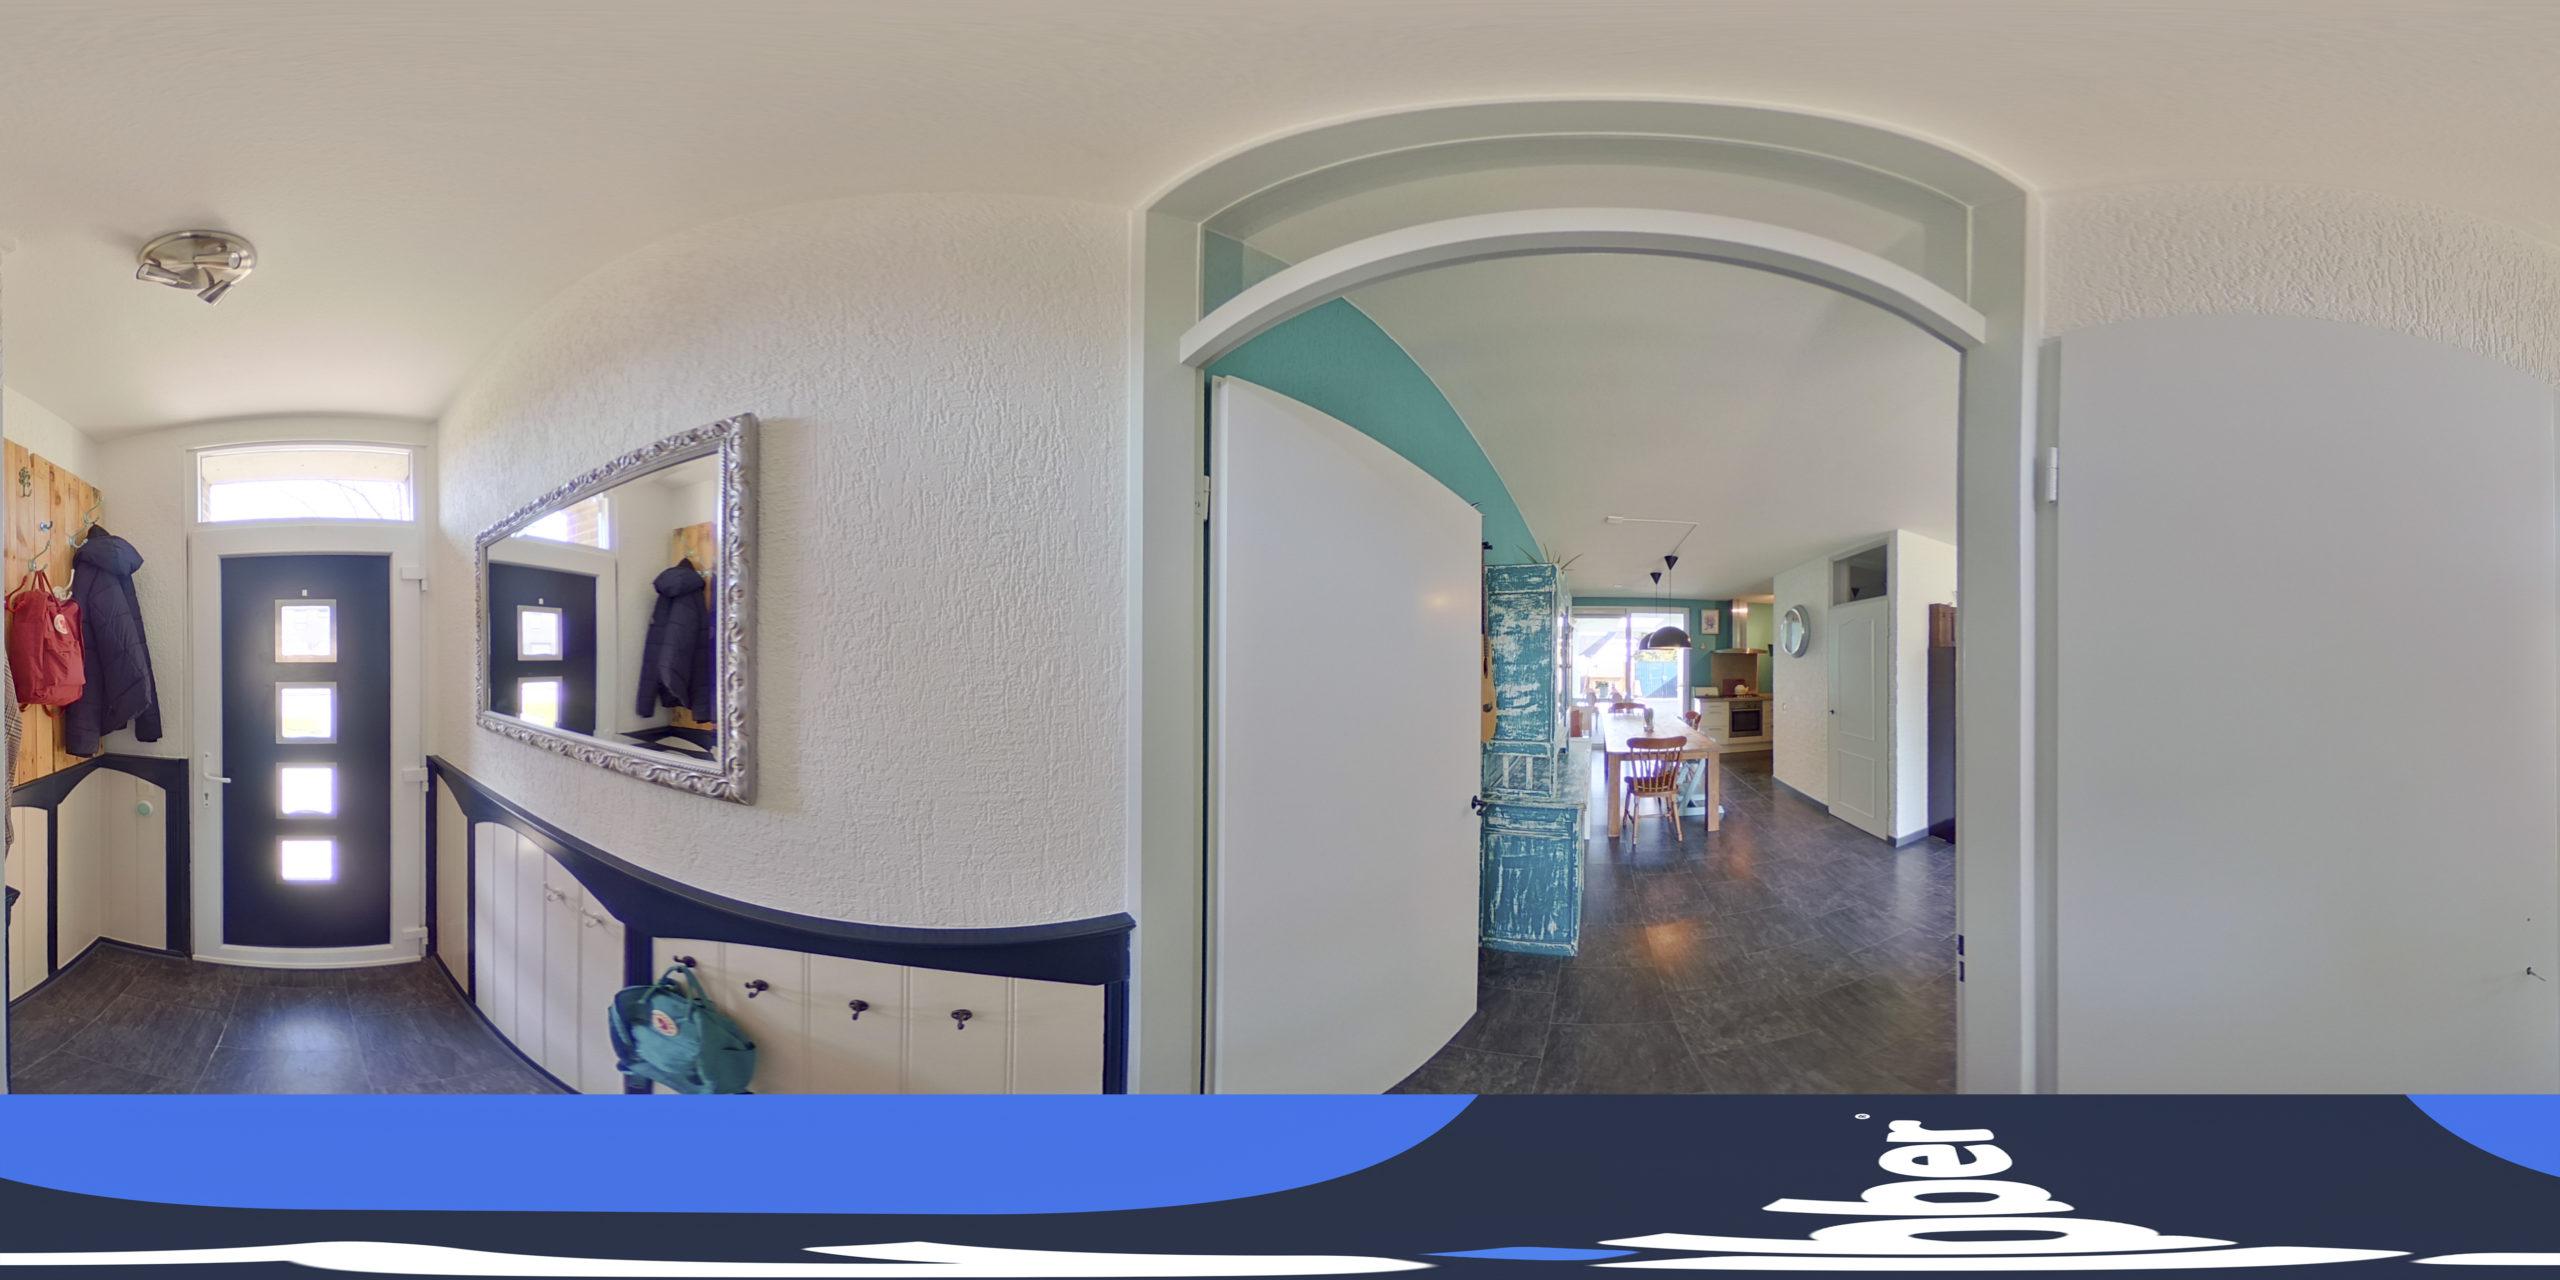 4001_Gerichtstraat4Stein-360-02